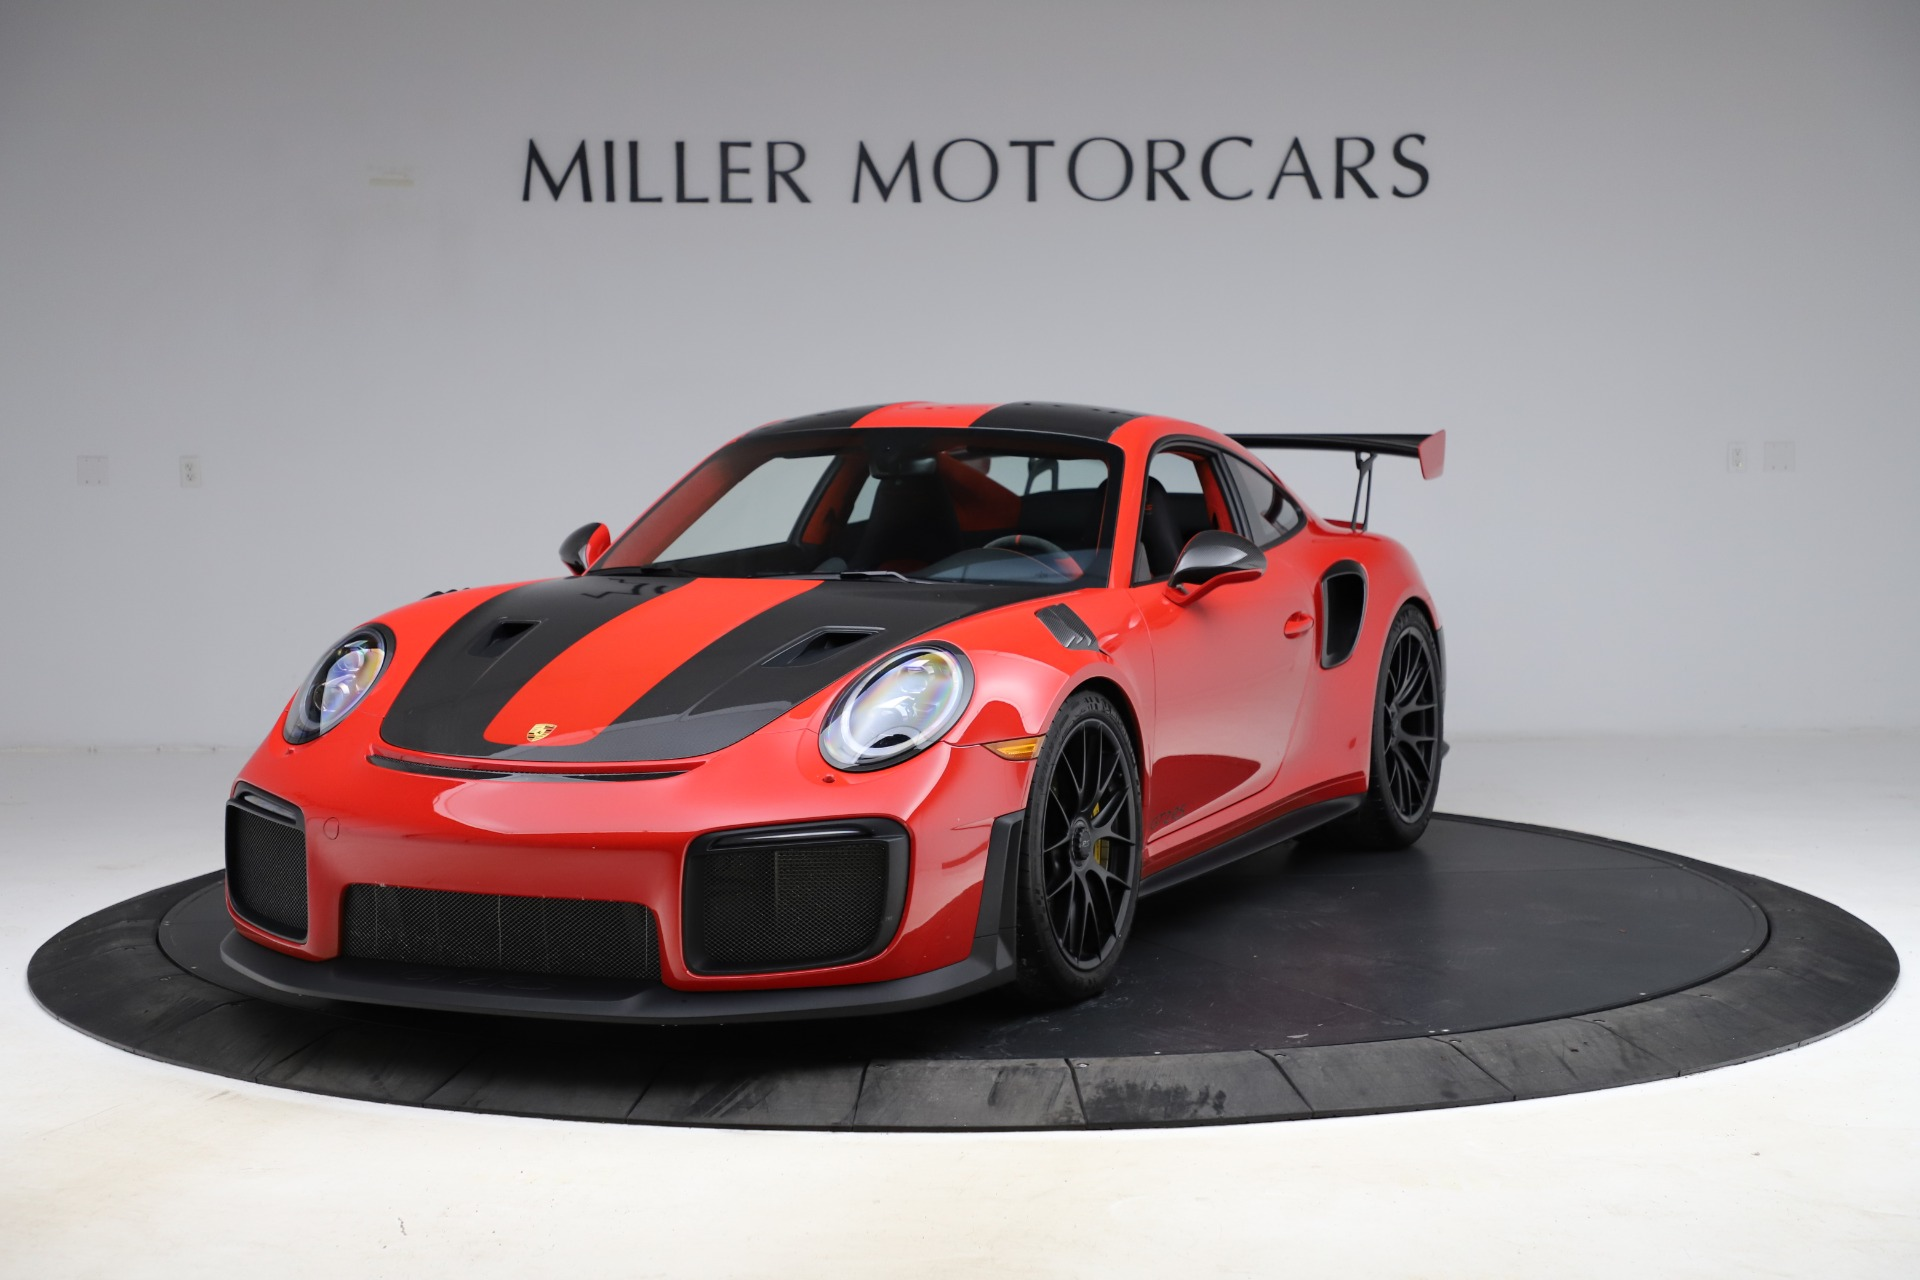 Used 2018 Porsche 911 GT2 RS for sale $325,900 at Alfa Romeo of Westport in Westport CT 06880 1